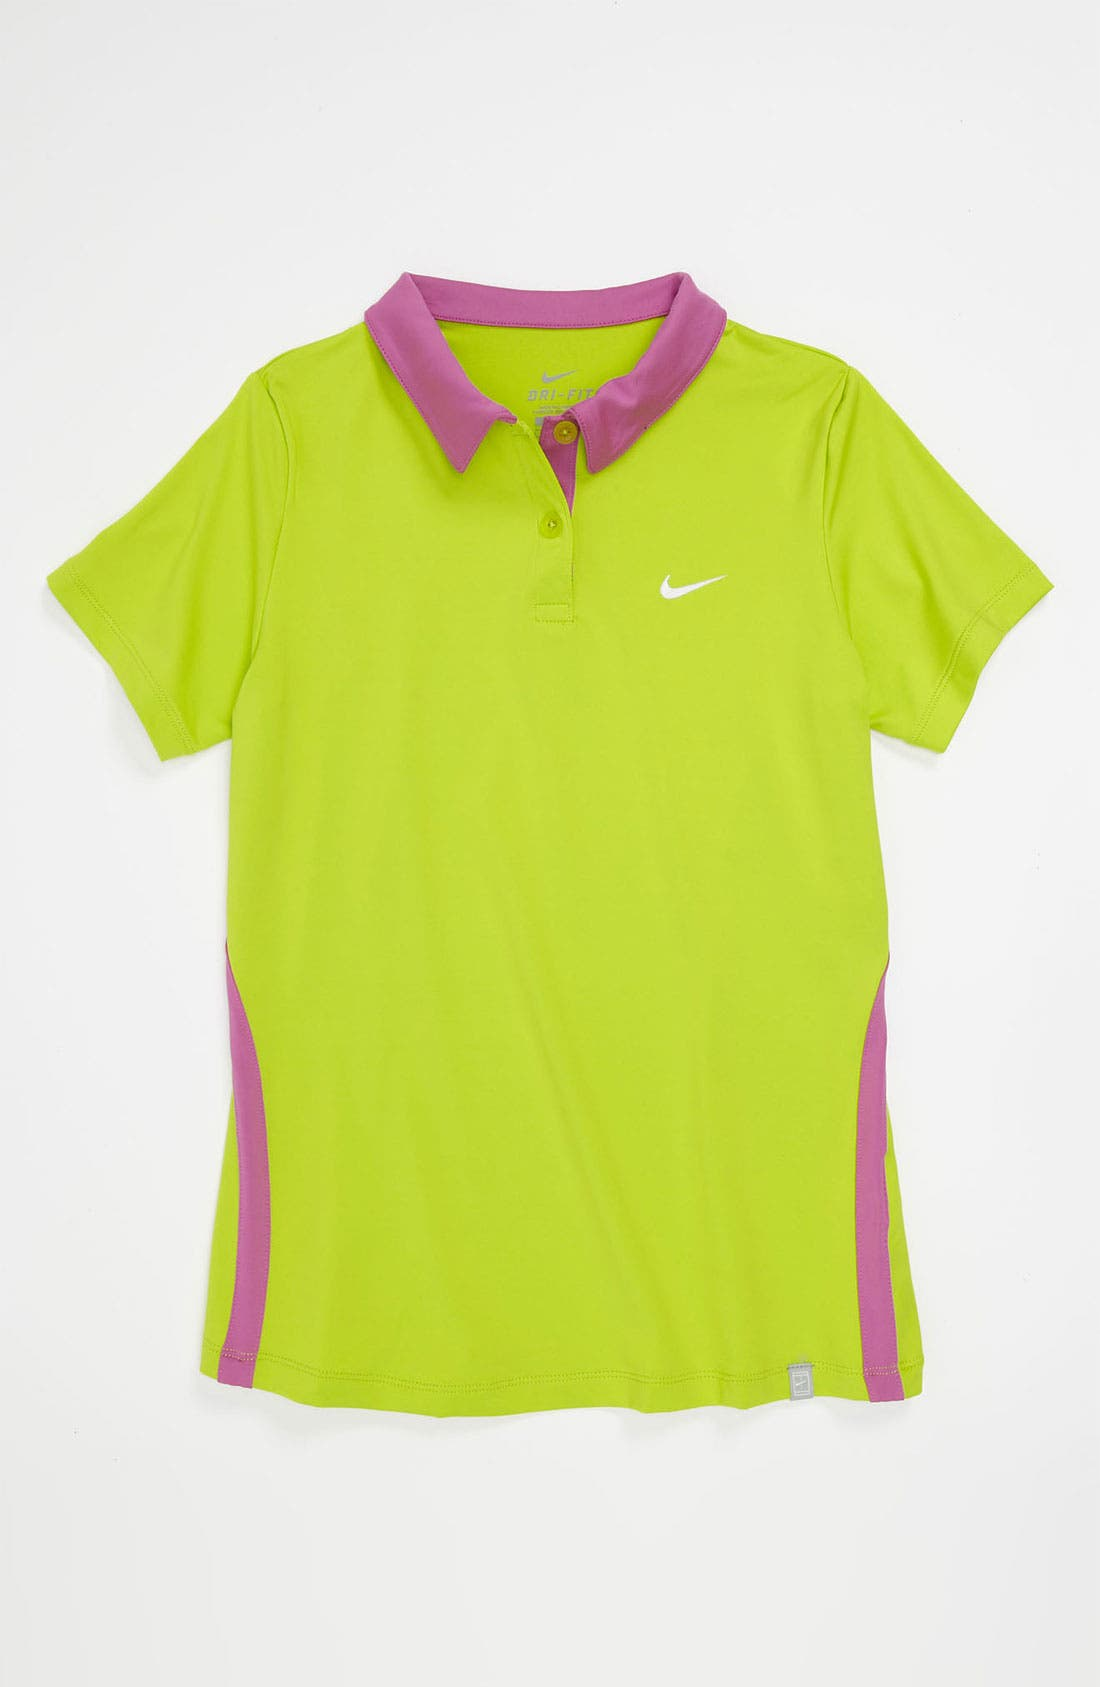 Alternate Image 1 Selected - Nike 'Border' Tennis Polo (Big Girls)